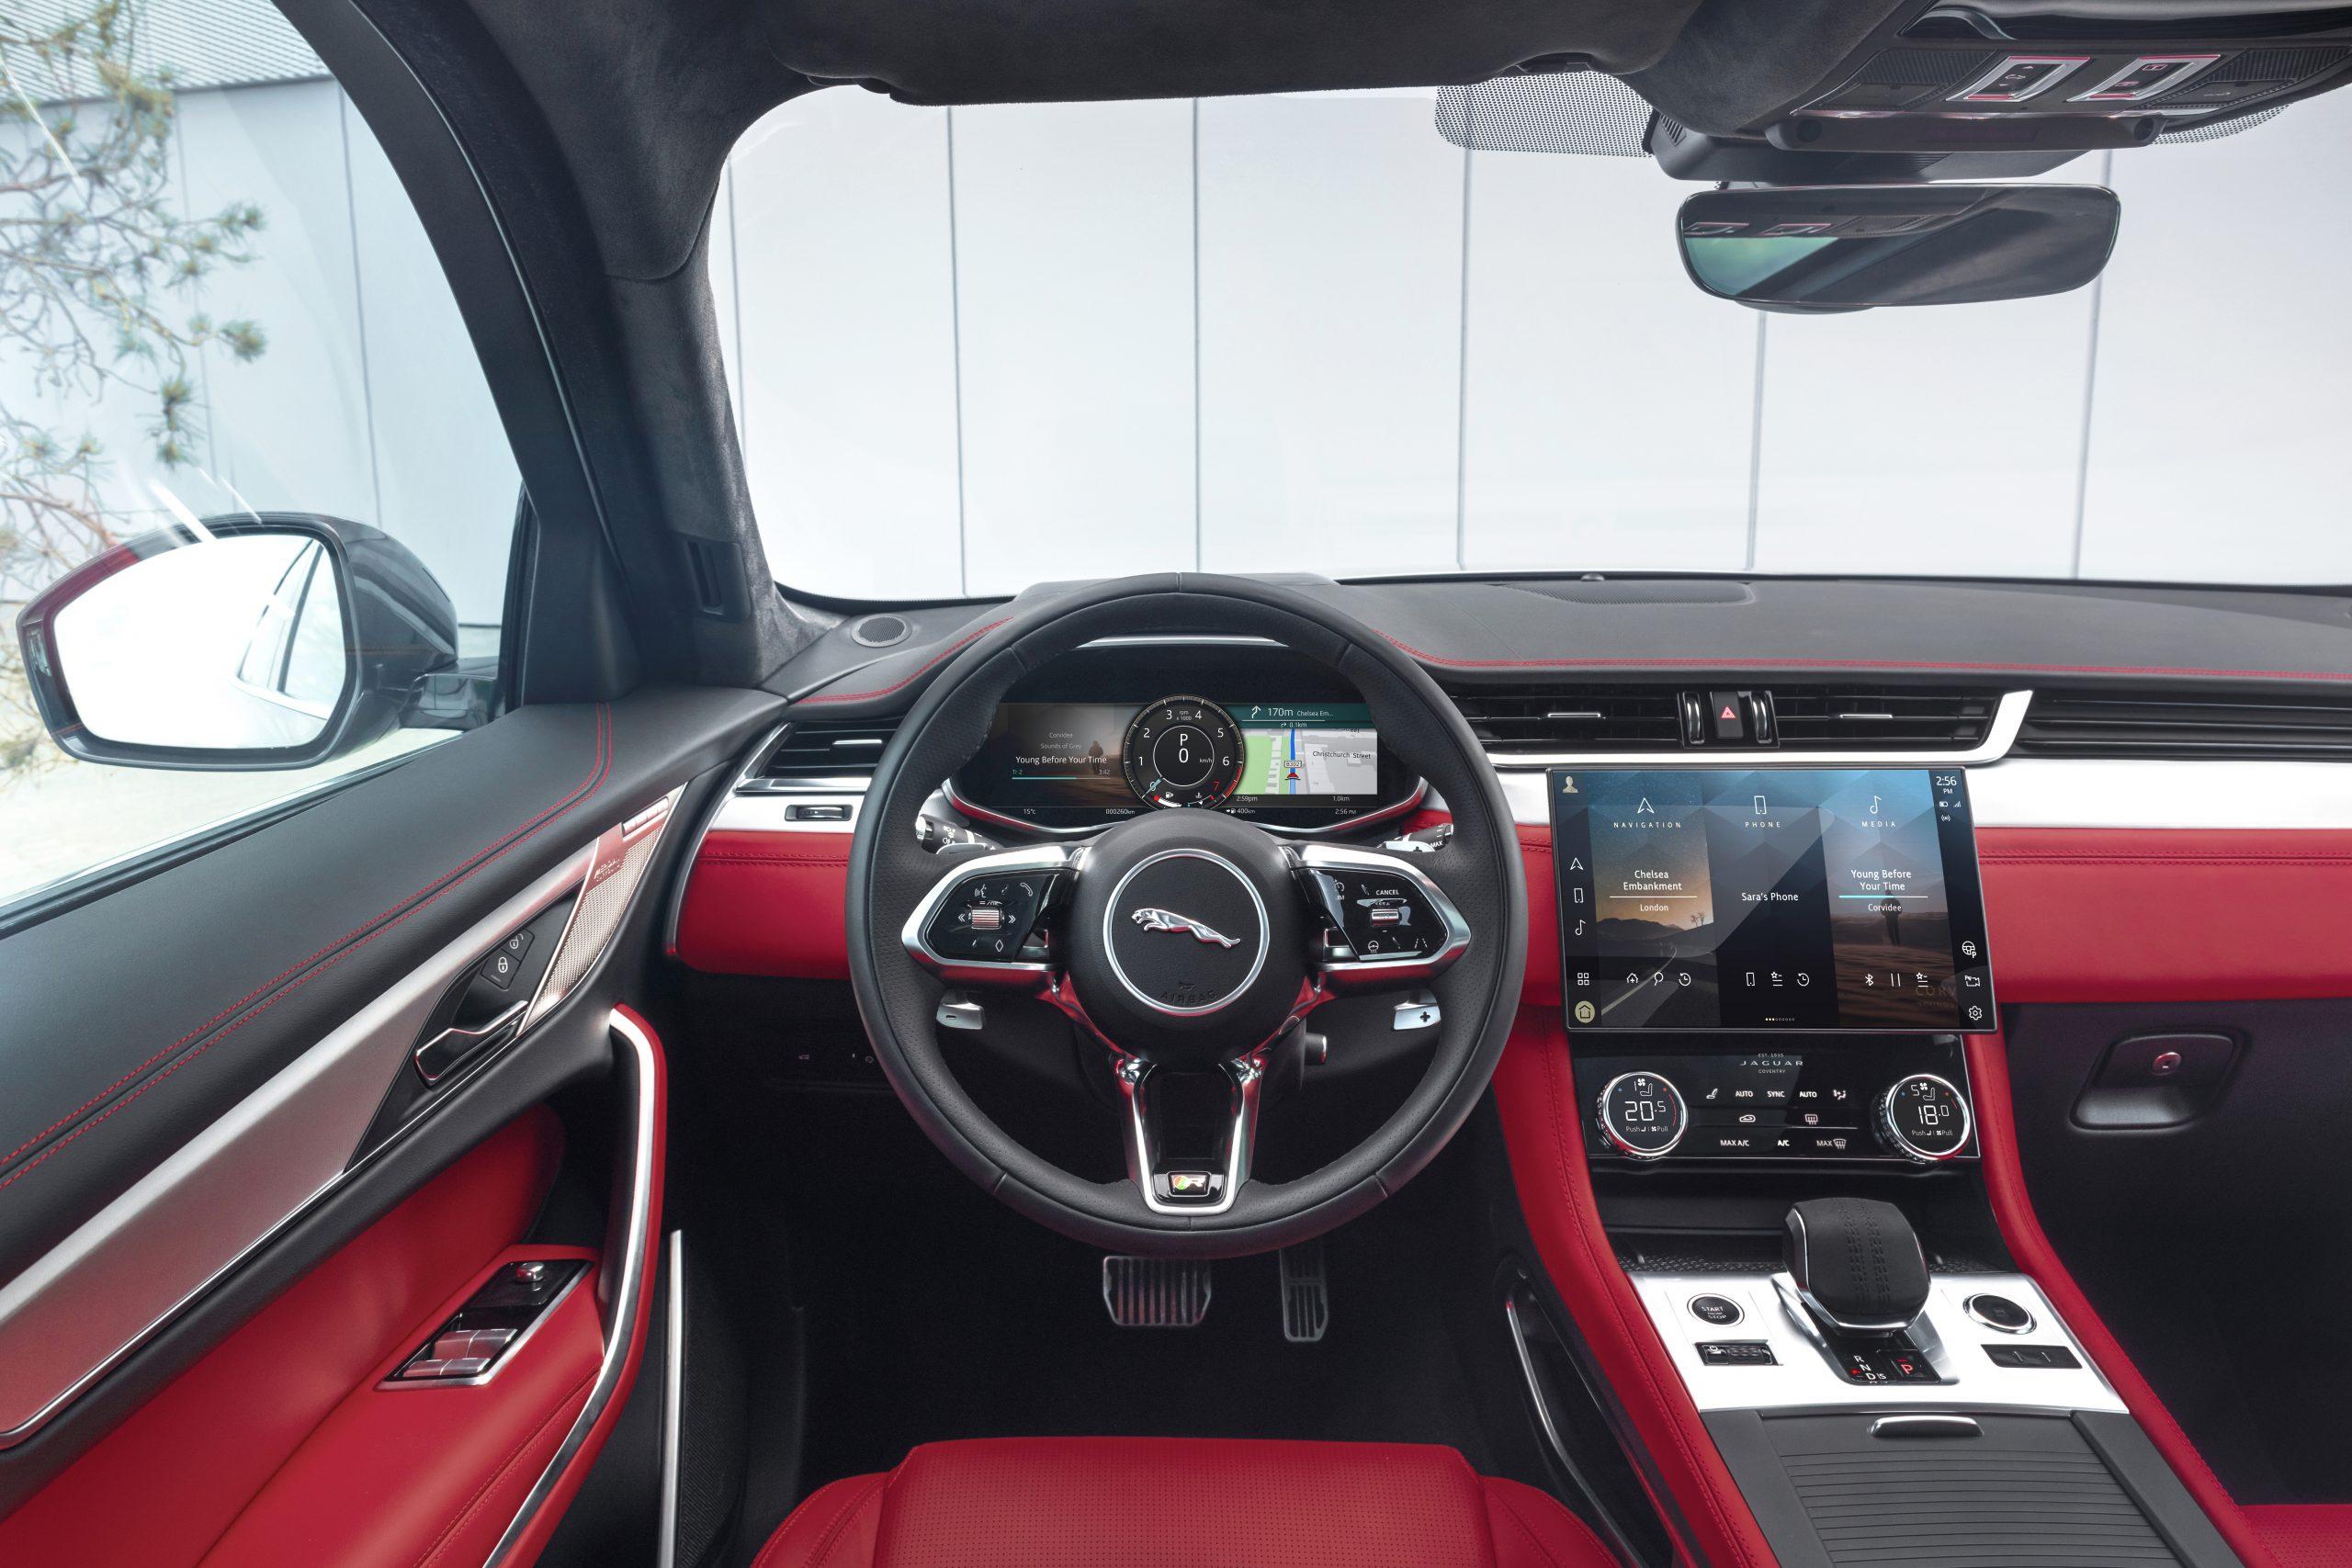 2021 Jaguar F-PACE interior driver seat